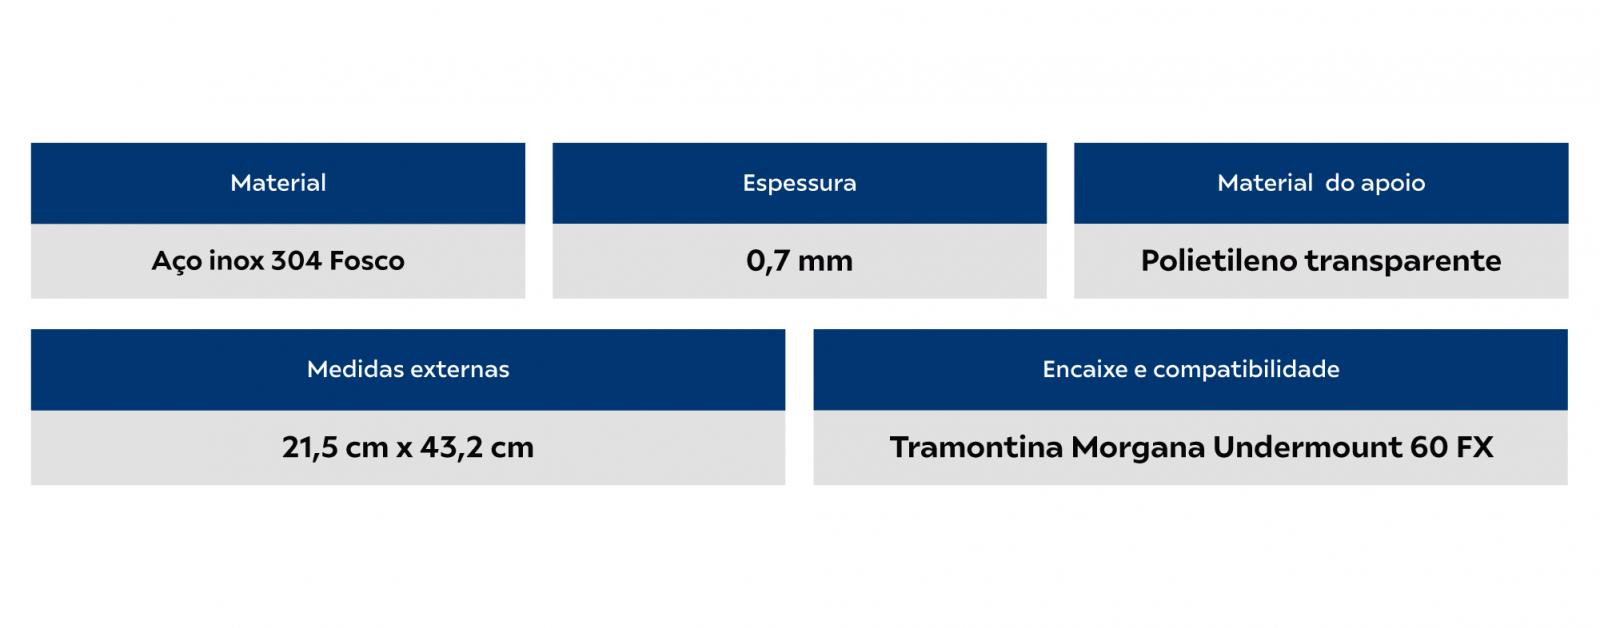 Cesto Aramado Inox Para Cuba Morgana 60FX(68x50)Tramontina